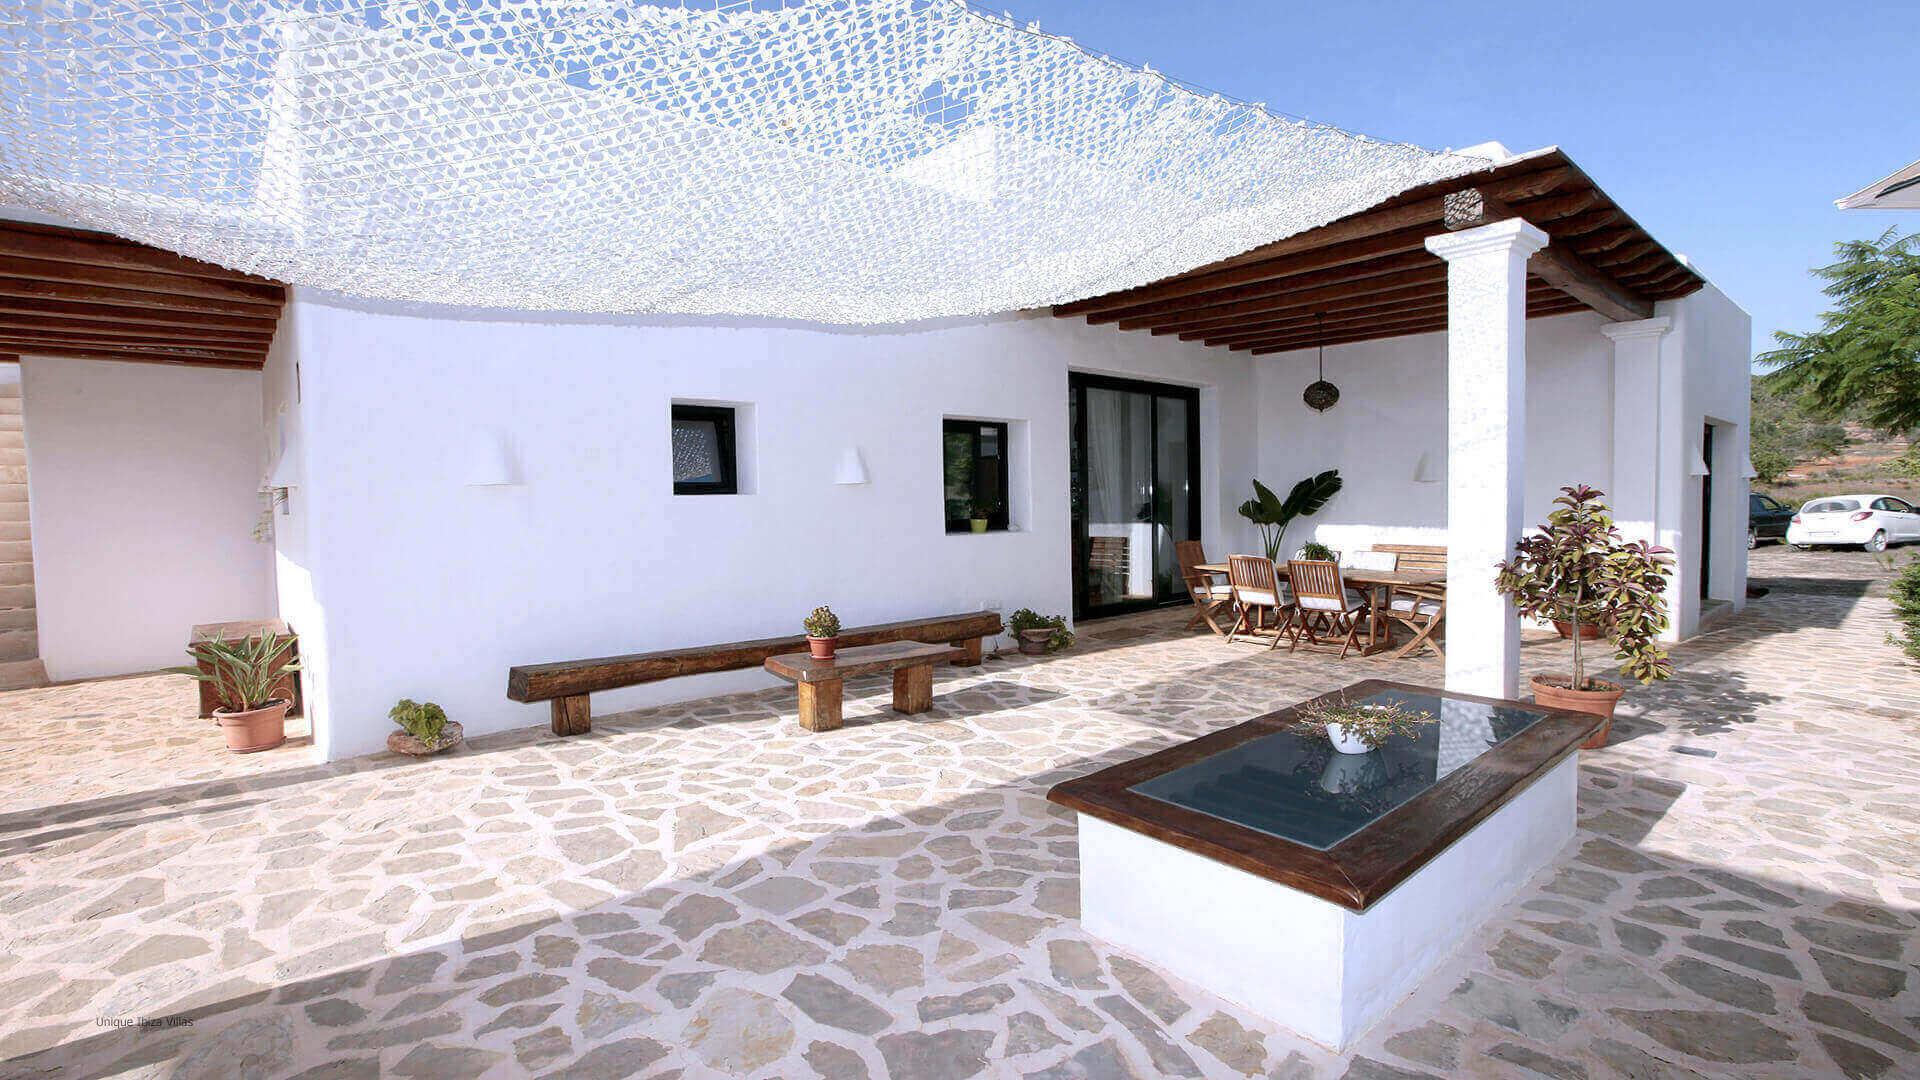 Cana Marieta Ibiza Villa 8 Near San Miguel